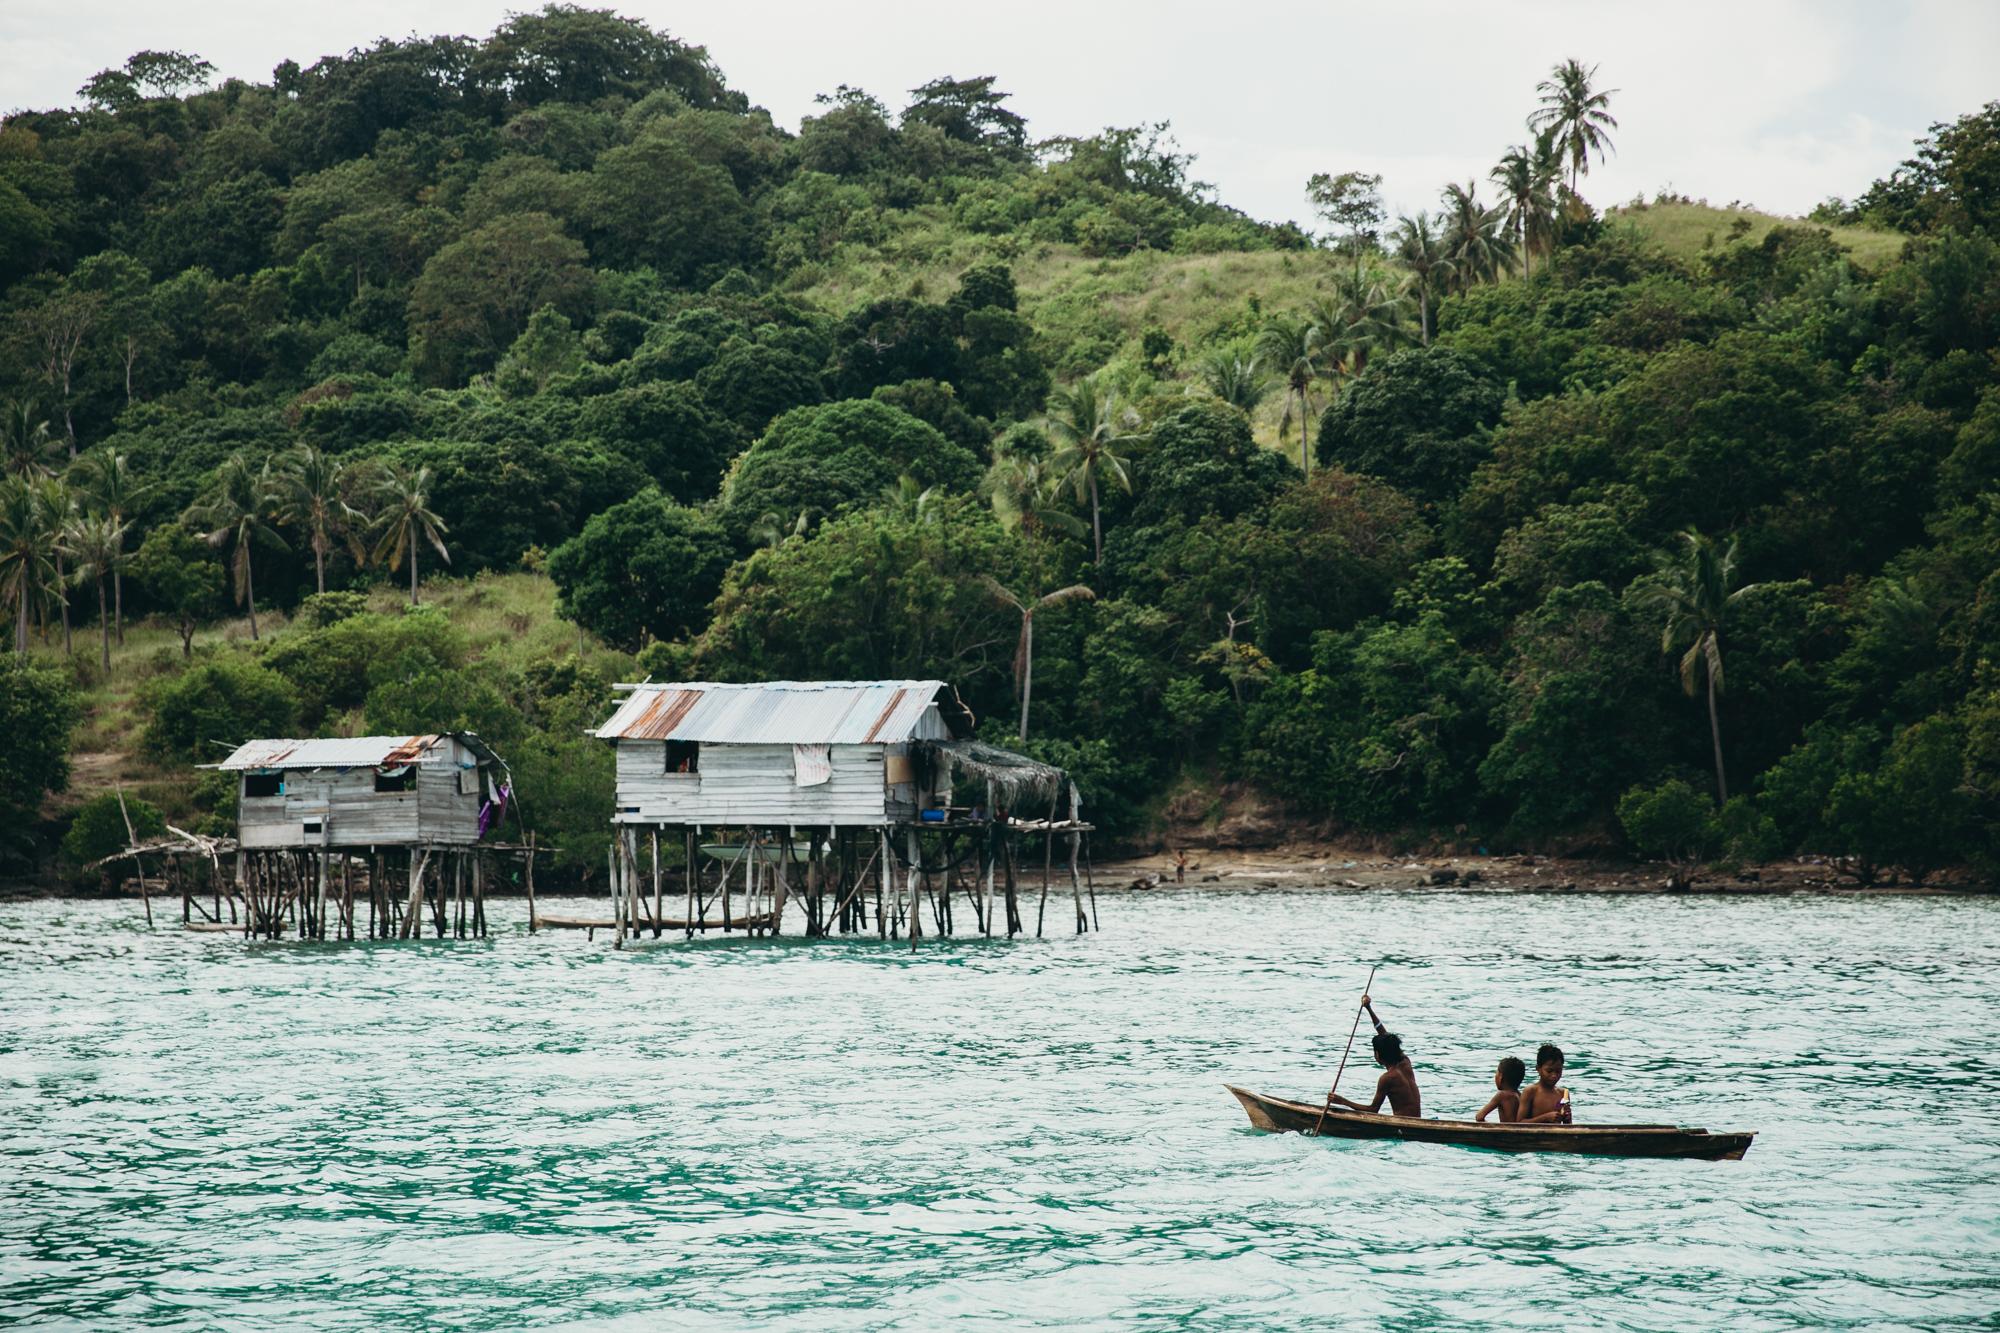 Borneo_HBGOODIE2018 (26 of 38).jpg